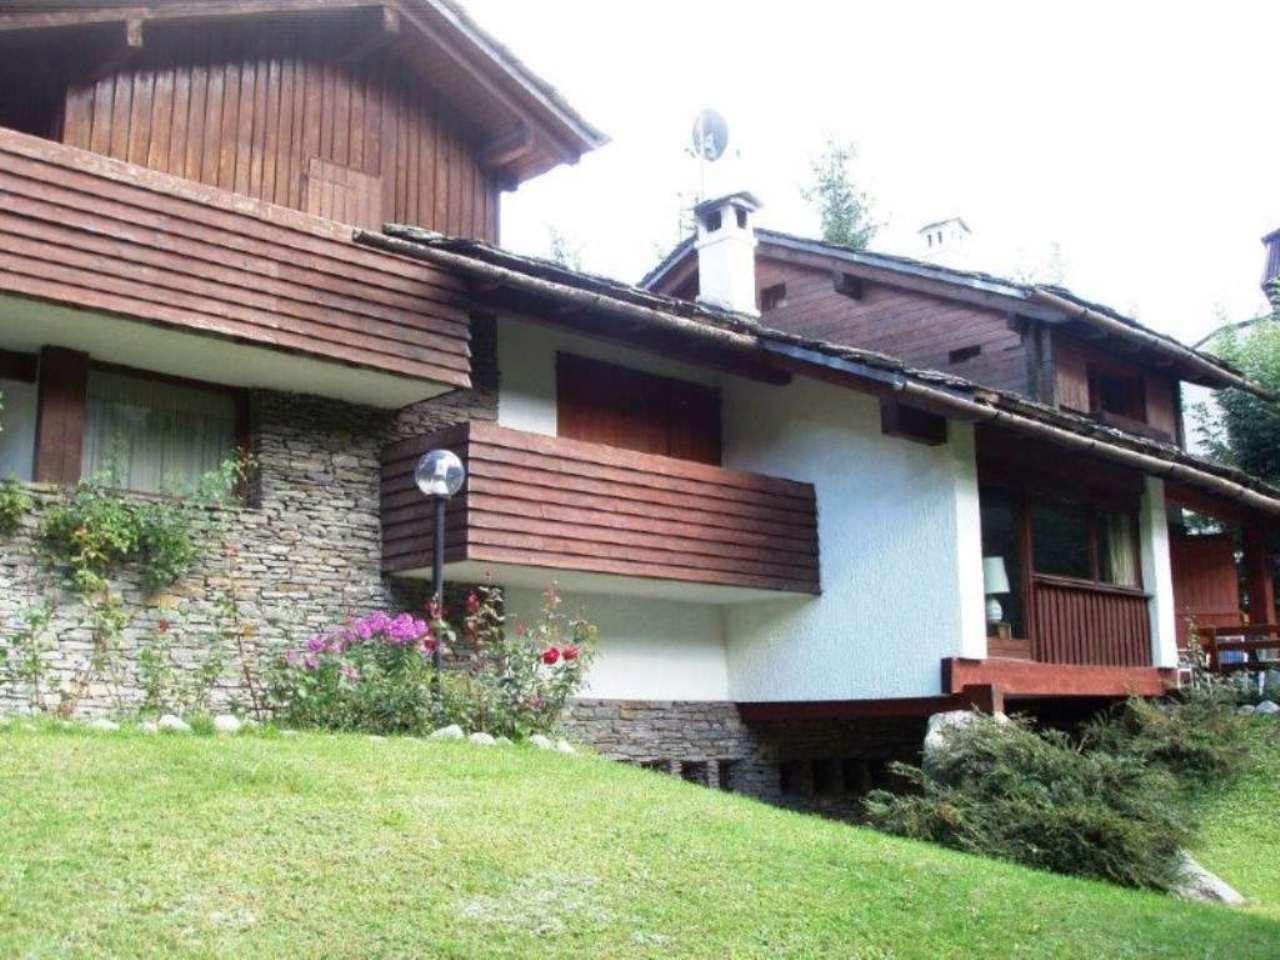 Villa in Vendita a Courmayeur: 5 locali, 450 mq - Foto 2